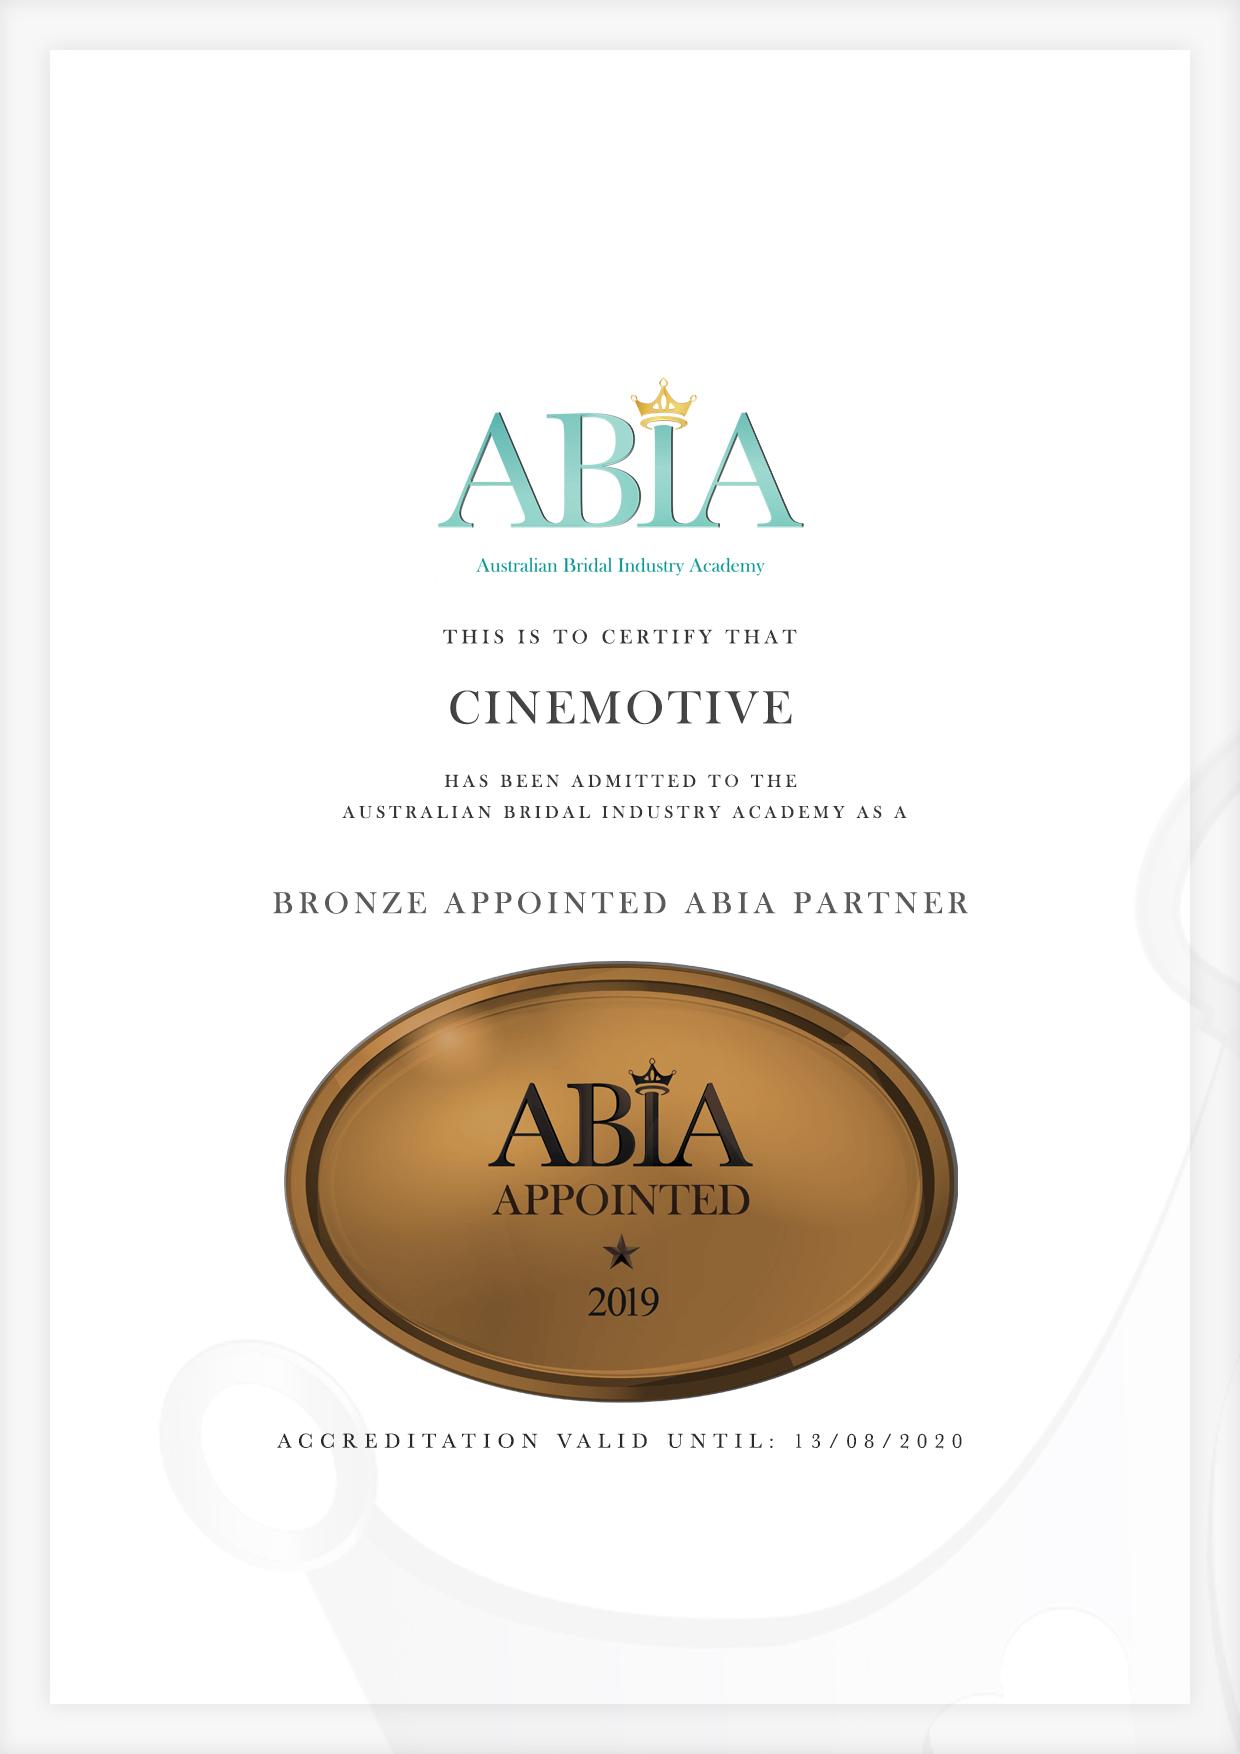 ABIA-Accreditation-Certificate-Cinemotive.jpg